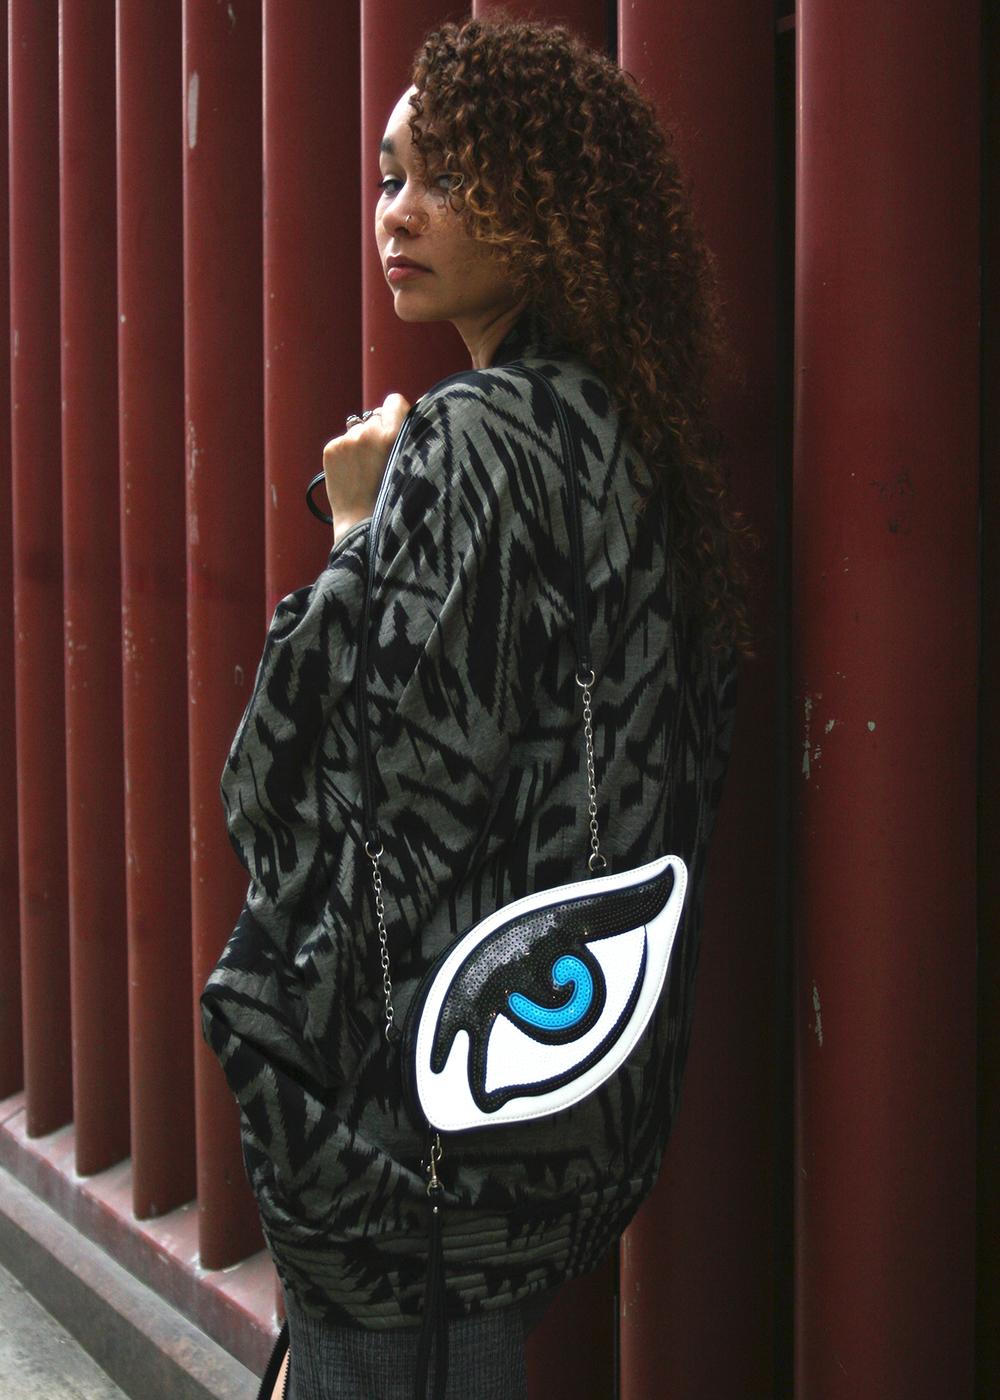 Kimono Backstreets - Athletic Clothes mixed with Graphic Kimonos Image 5